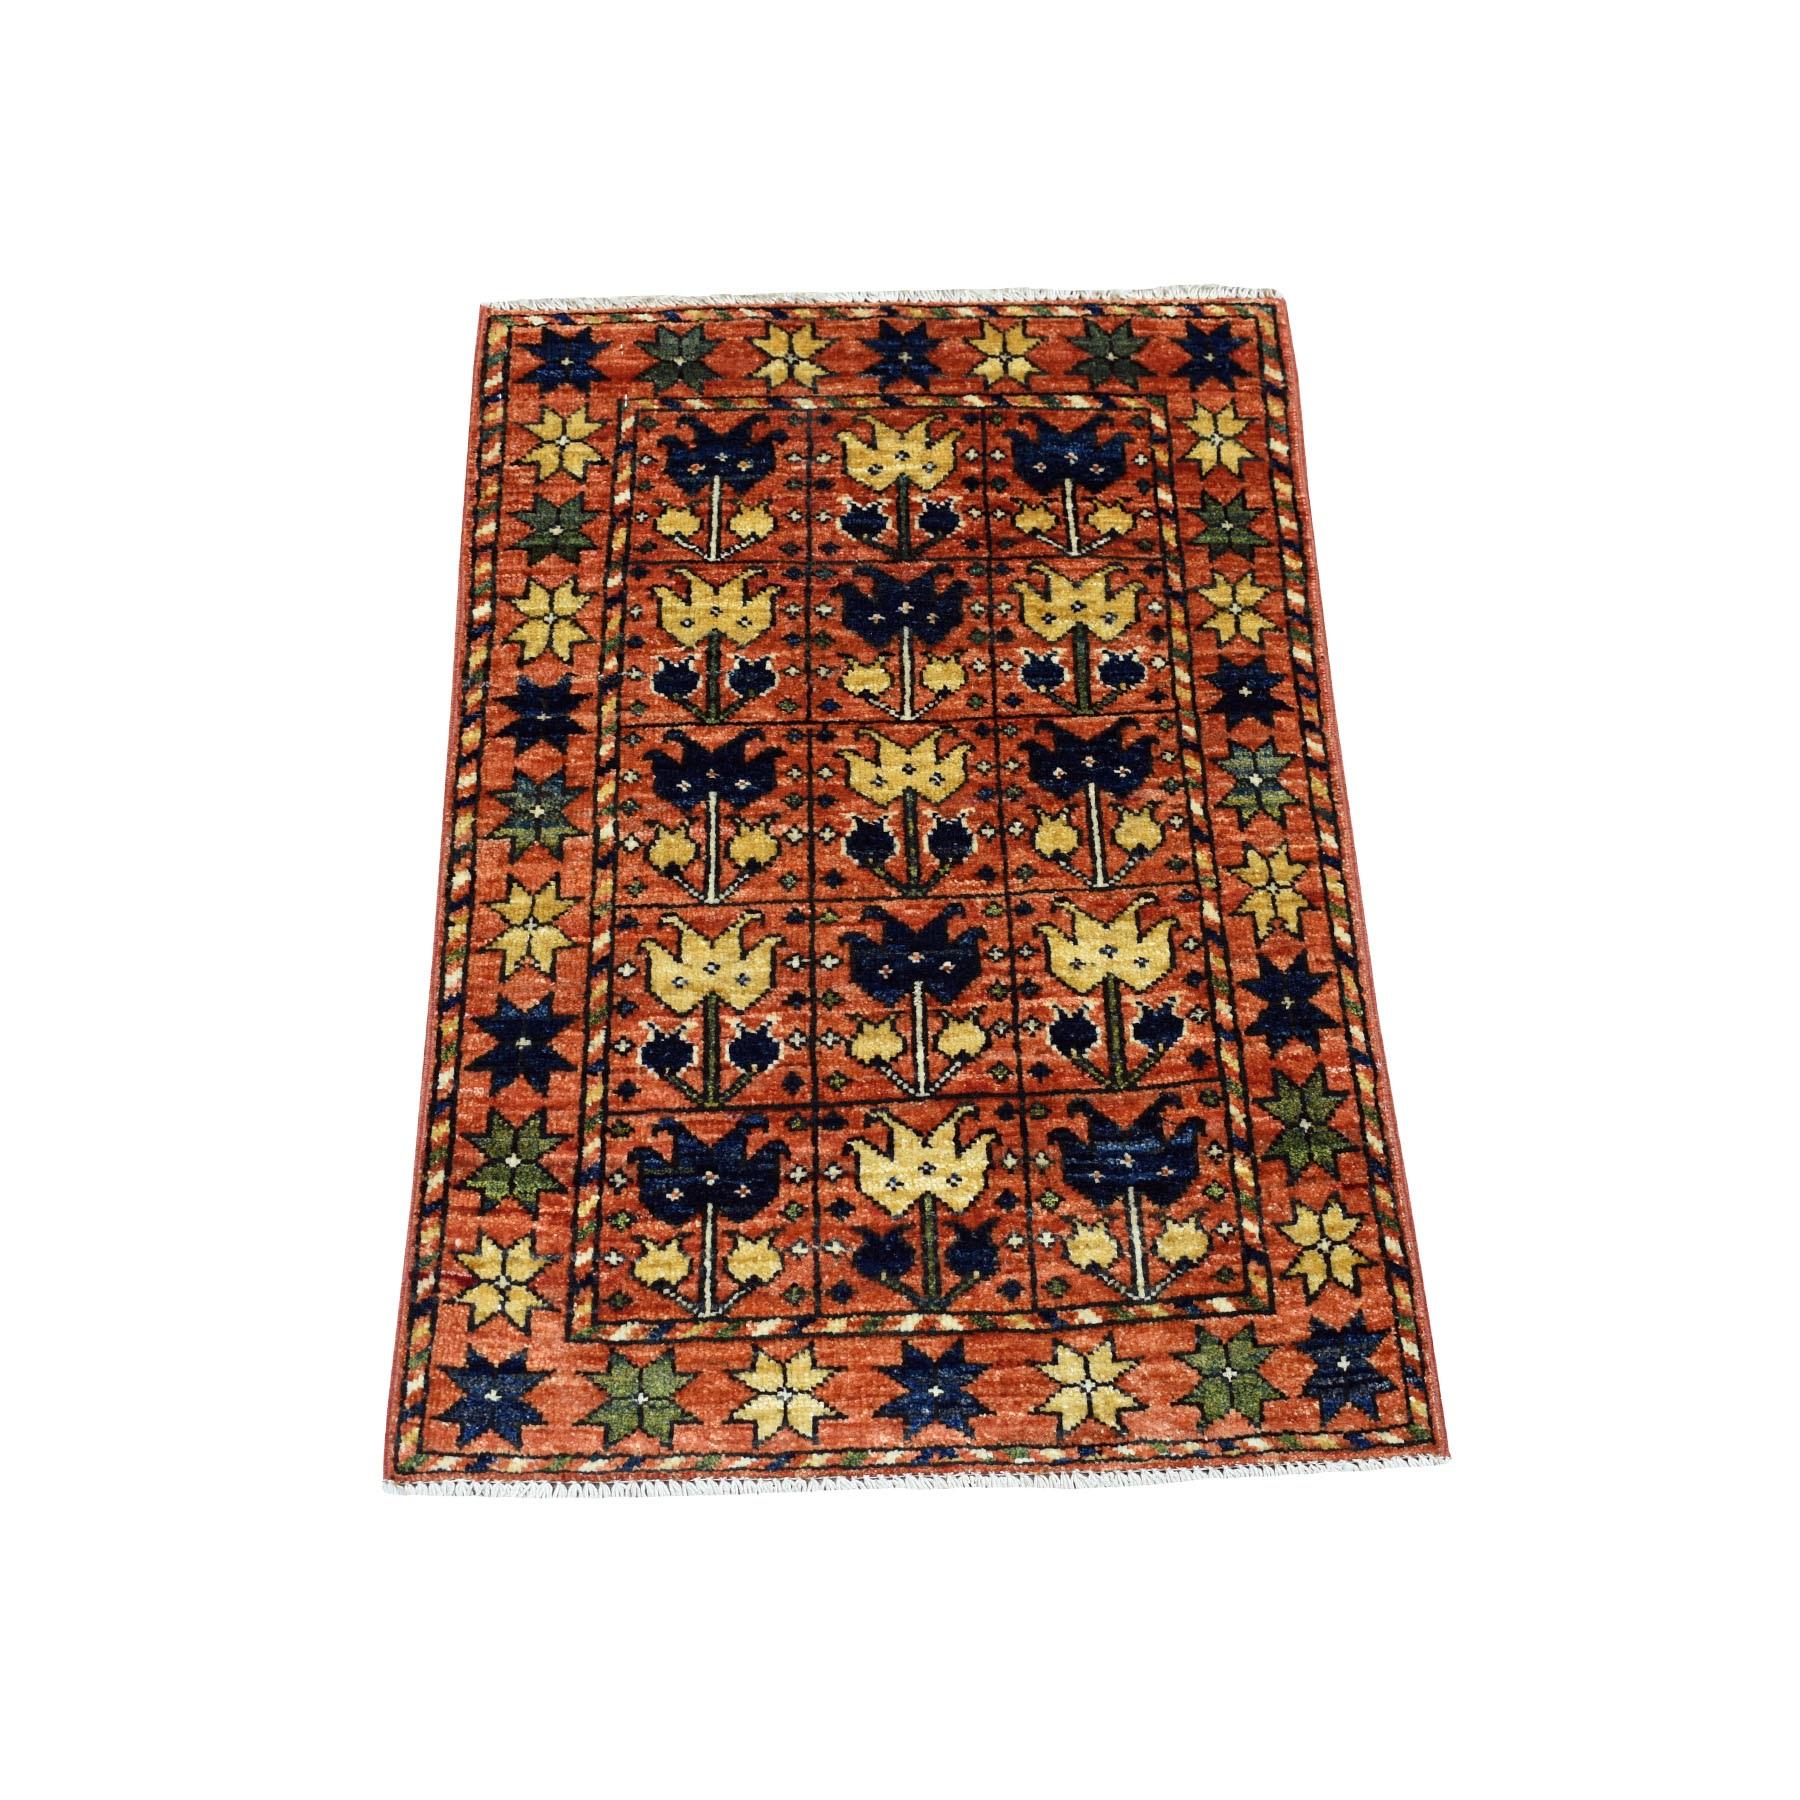 "2'x2'10"" Orange Afghan Ersari Tribal Design Hand Knotted Pure Wool Oriental Rug 53107"